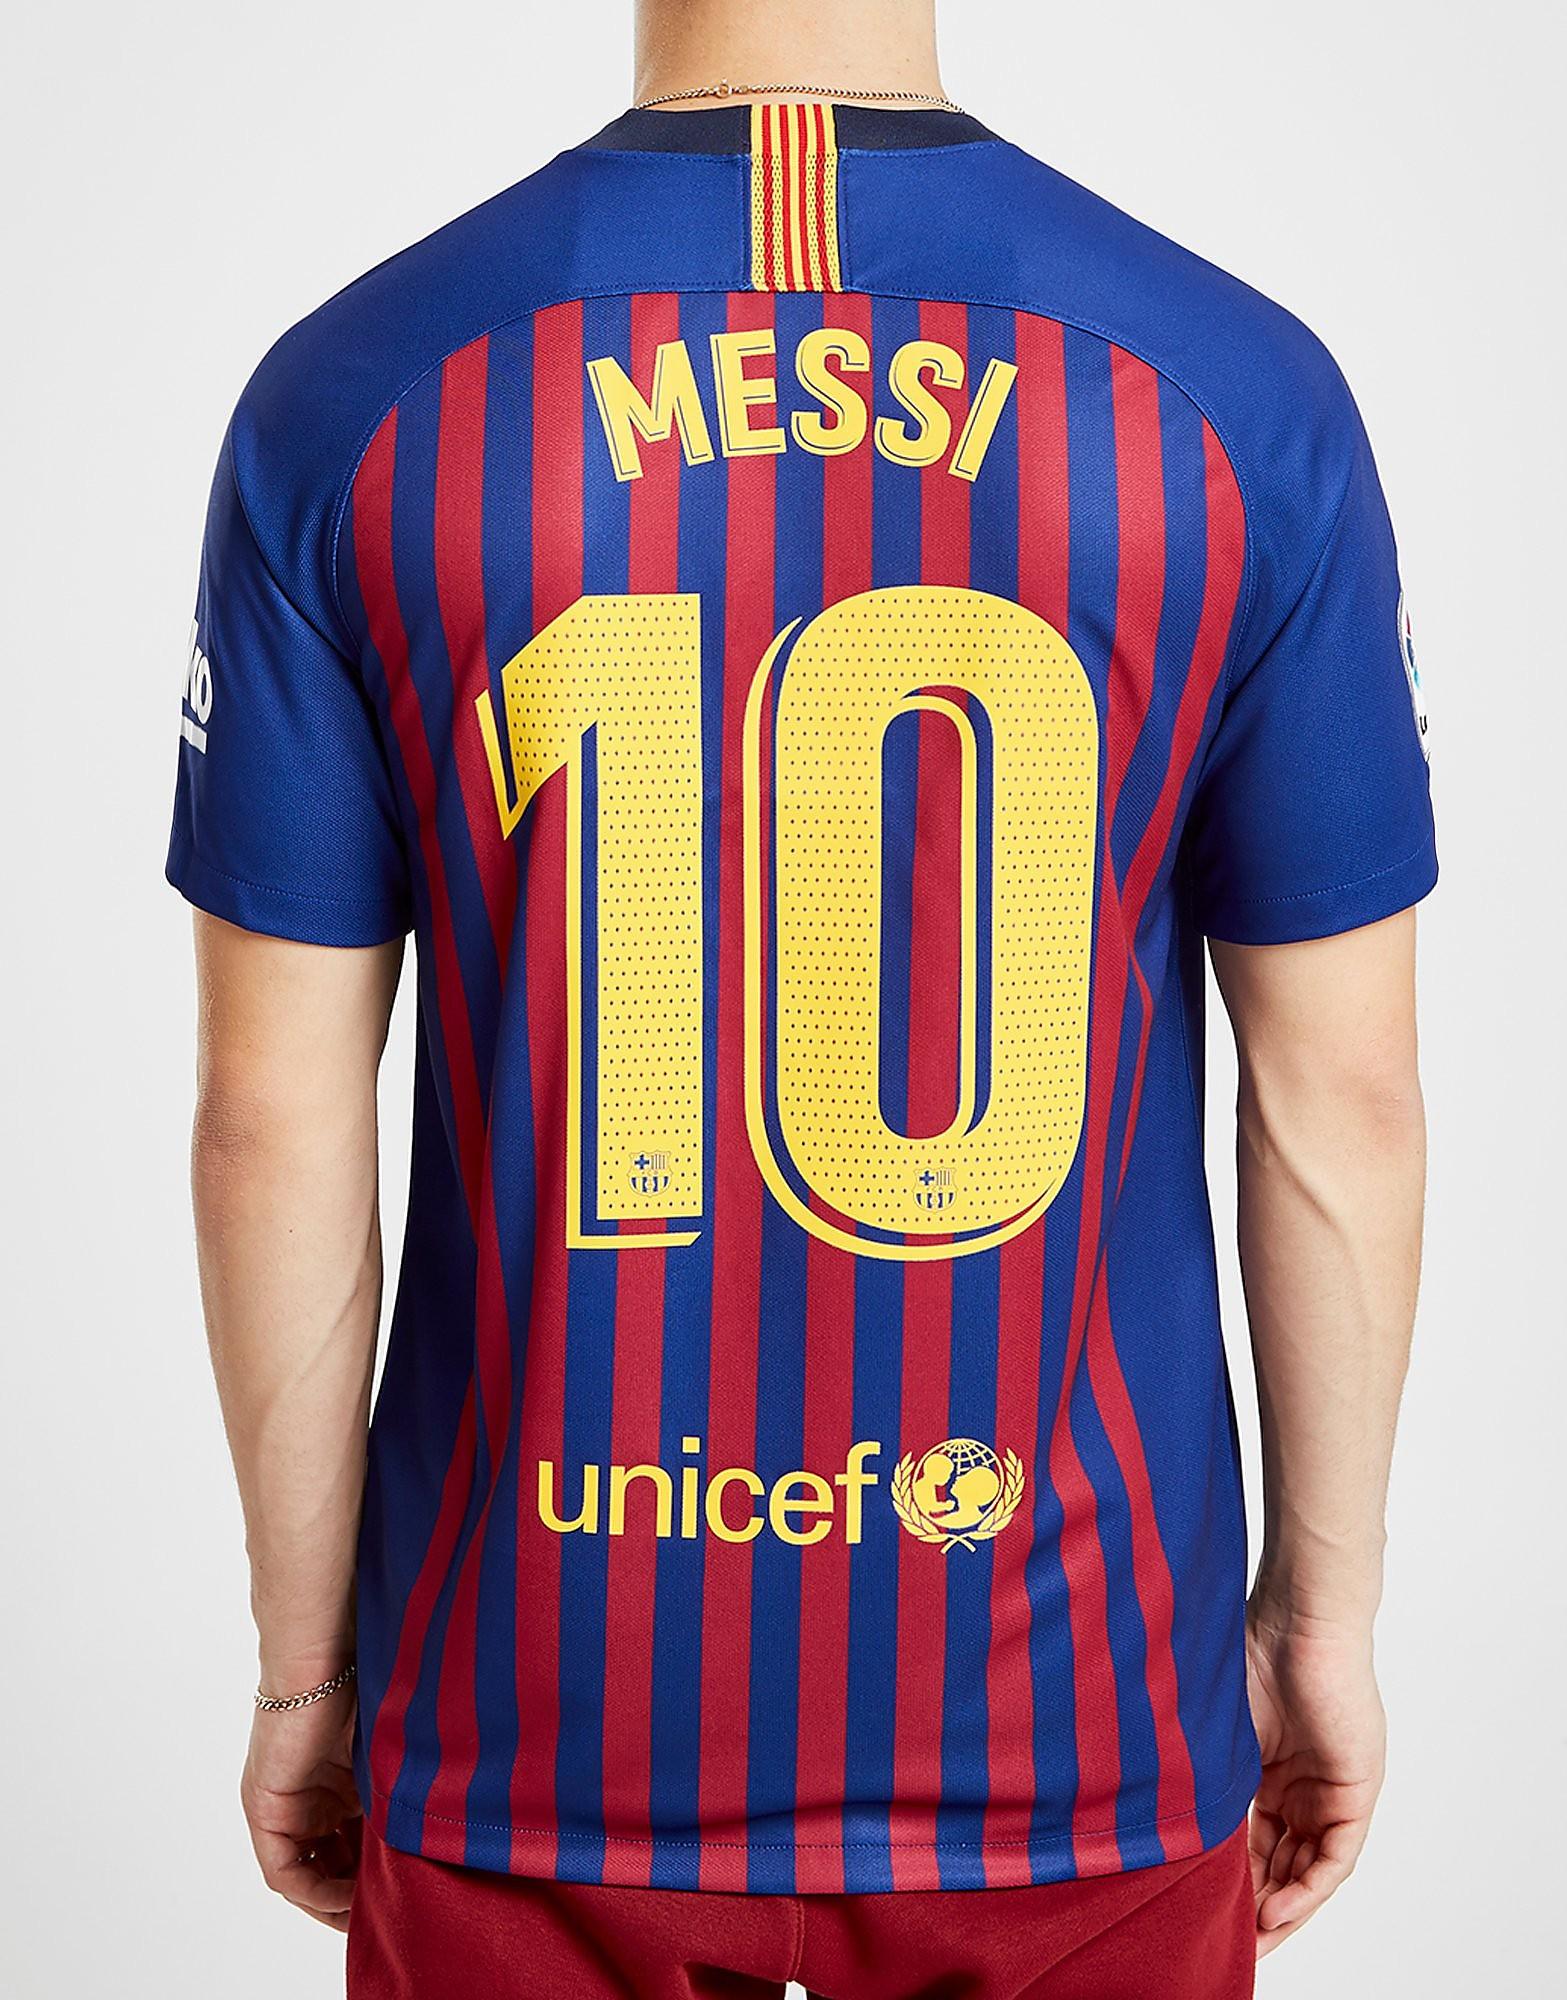 Fc Barcelona Football Kits Shirts Shorts Jd Sports